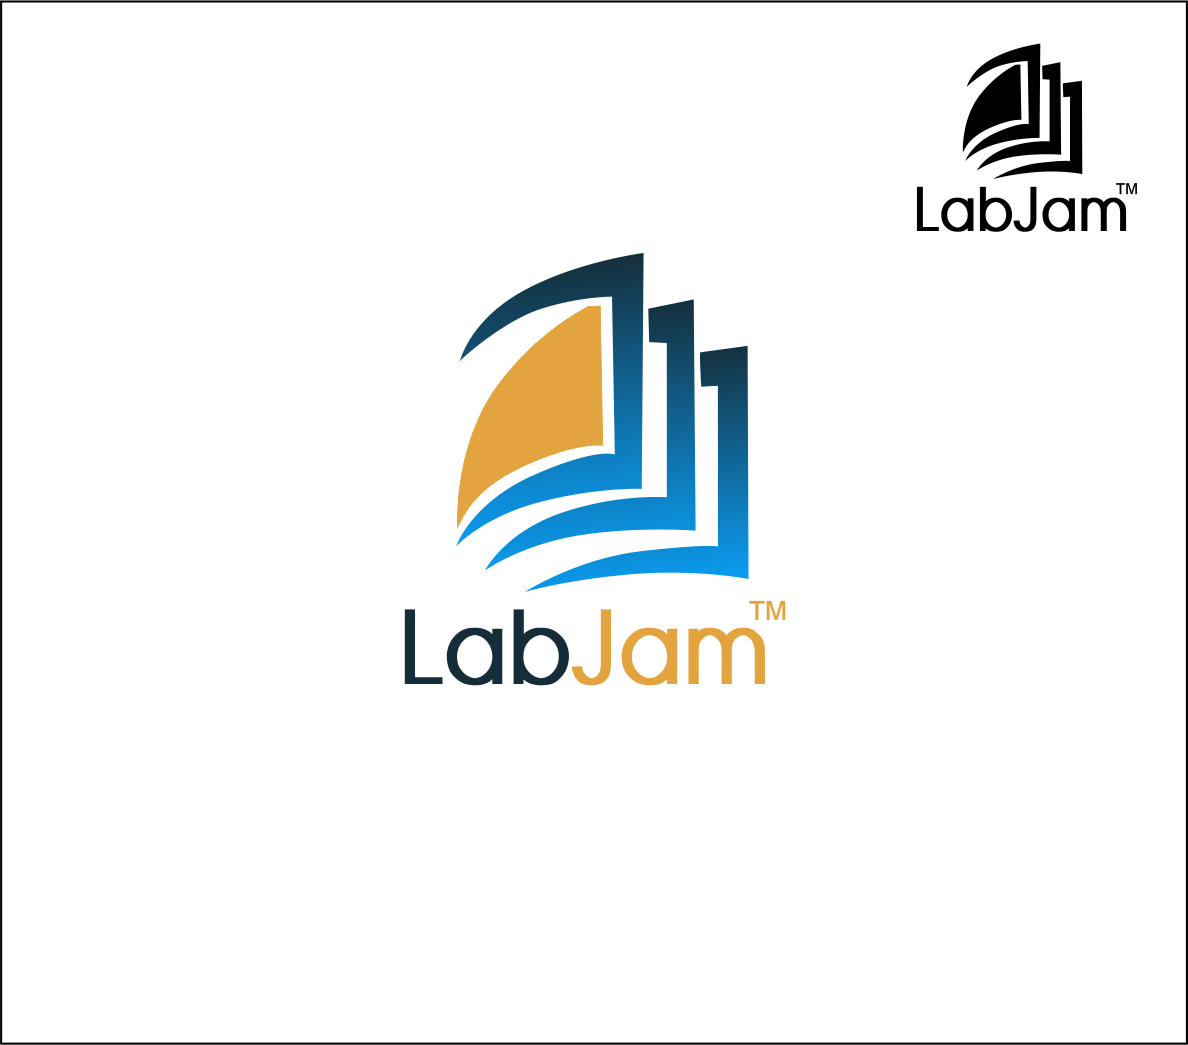 Logo Design by arkvisdesigns - Entry No. 60 in the Logo Design Contest Labjam.